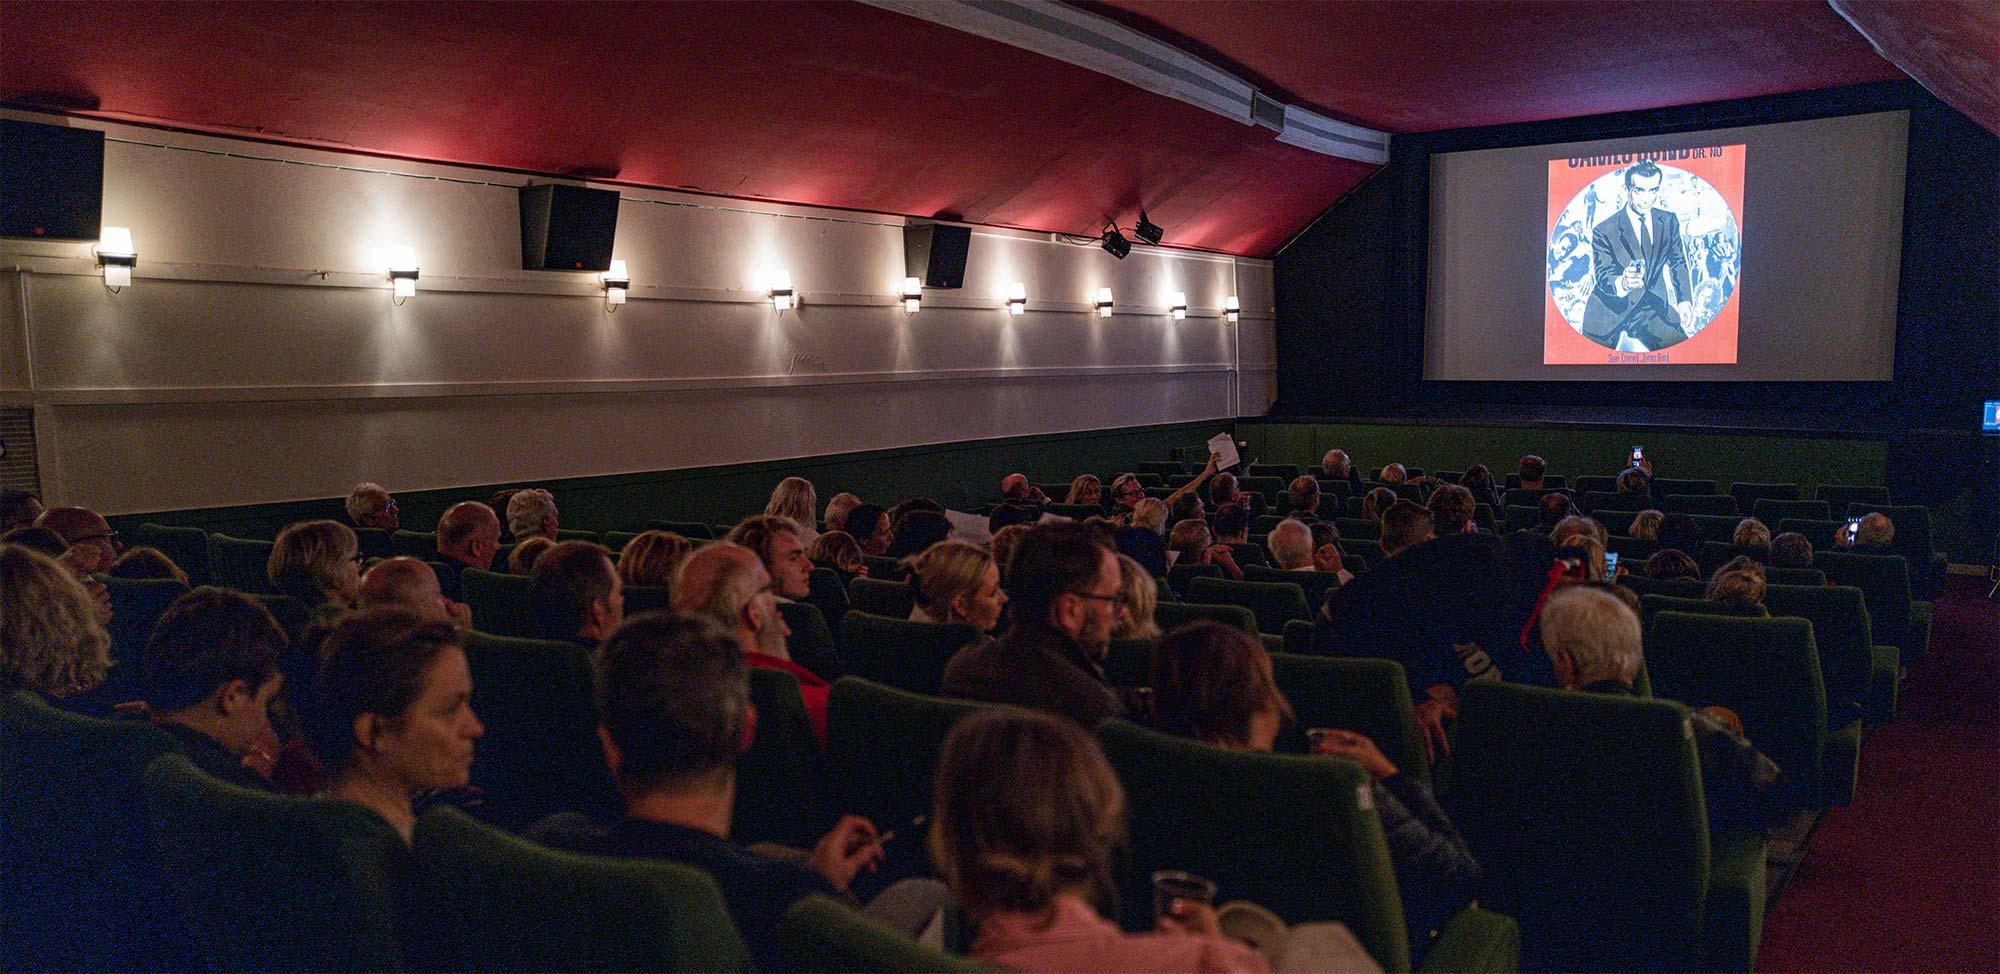 Der blev Bond-quizzet i biografsalen. Foto: TorbenStender.